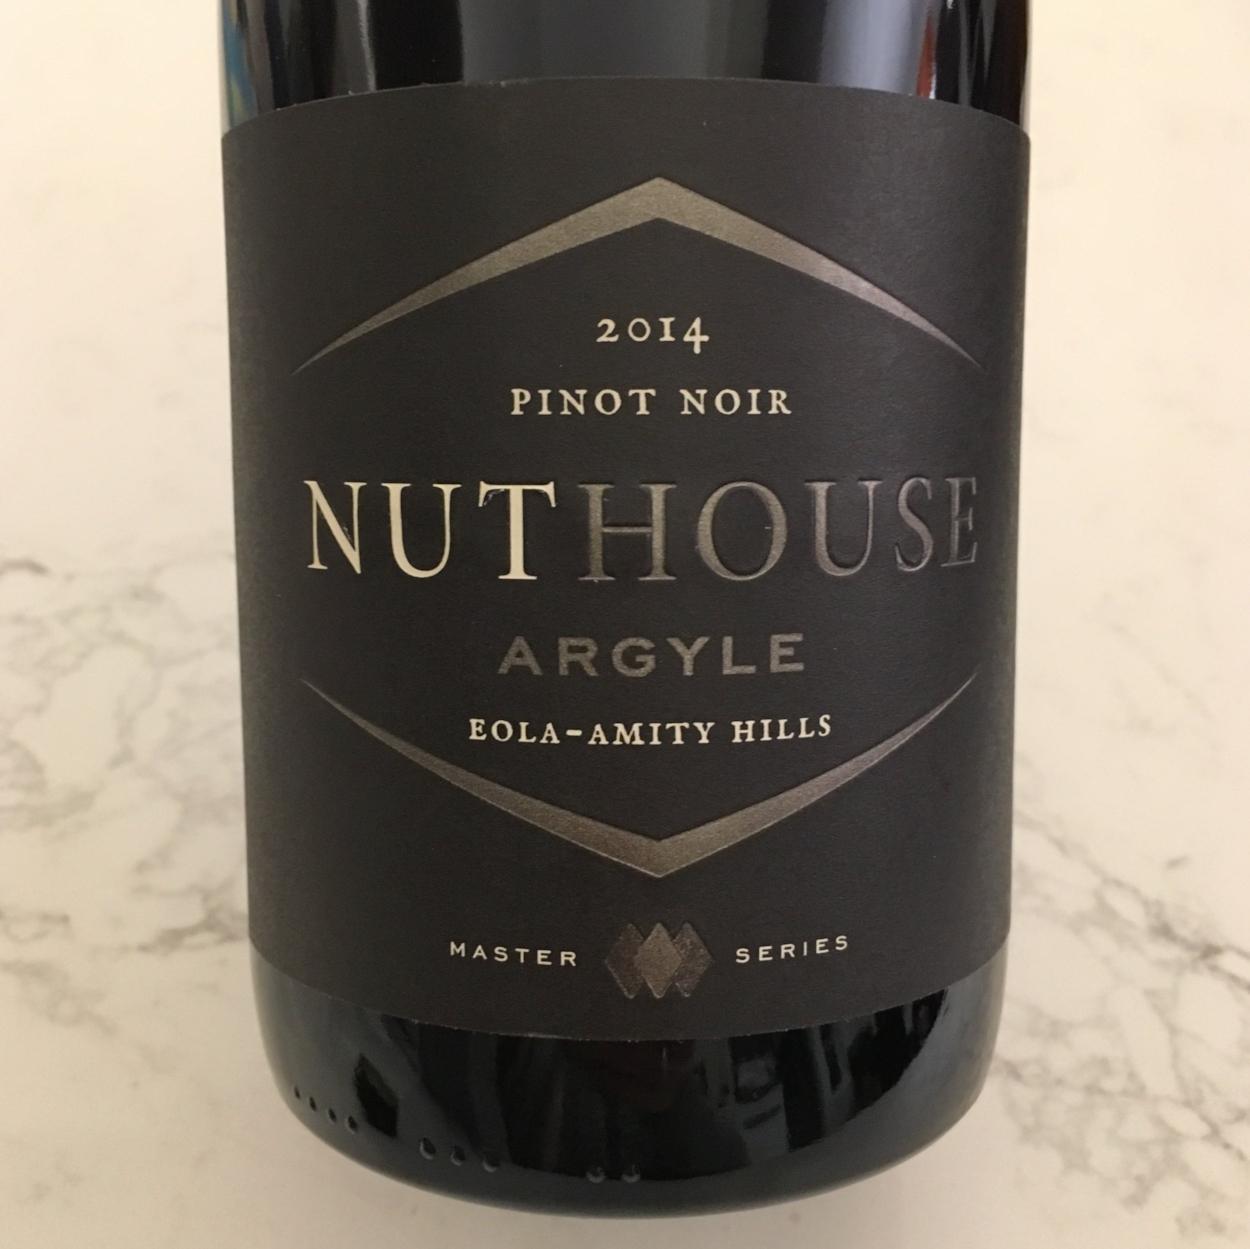 Argyle 2014 Nuthouse Pinot Noir